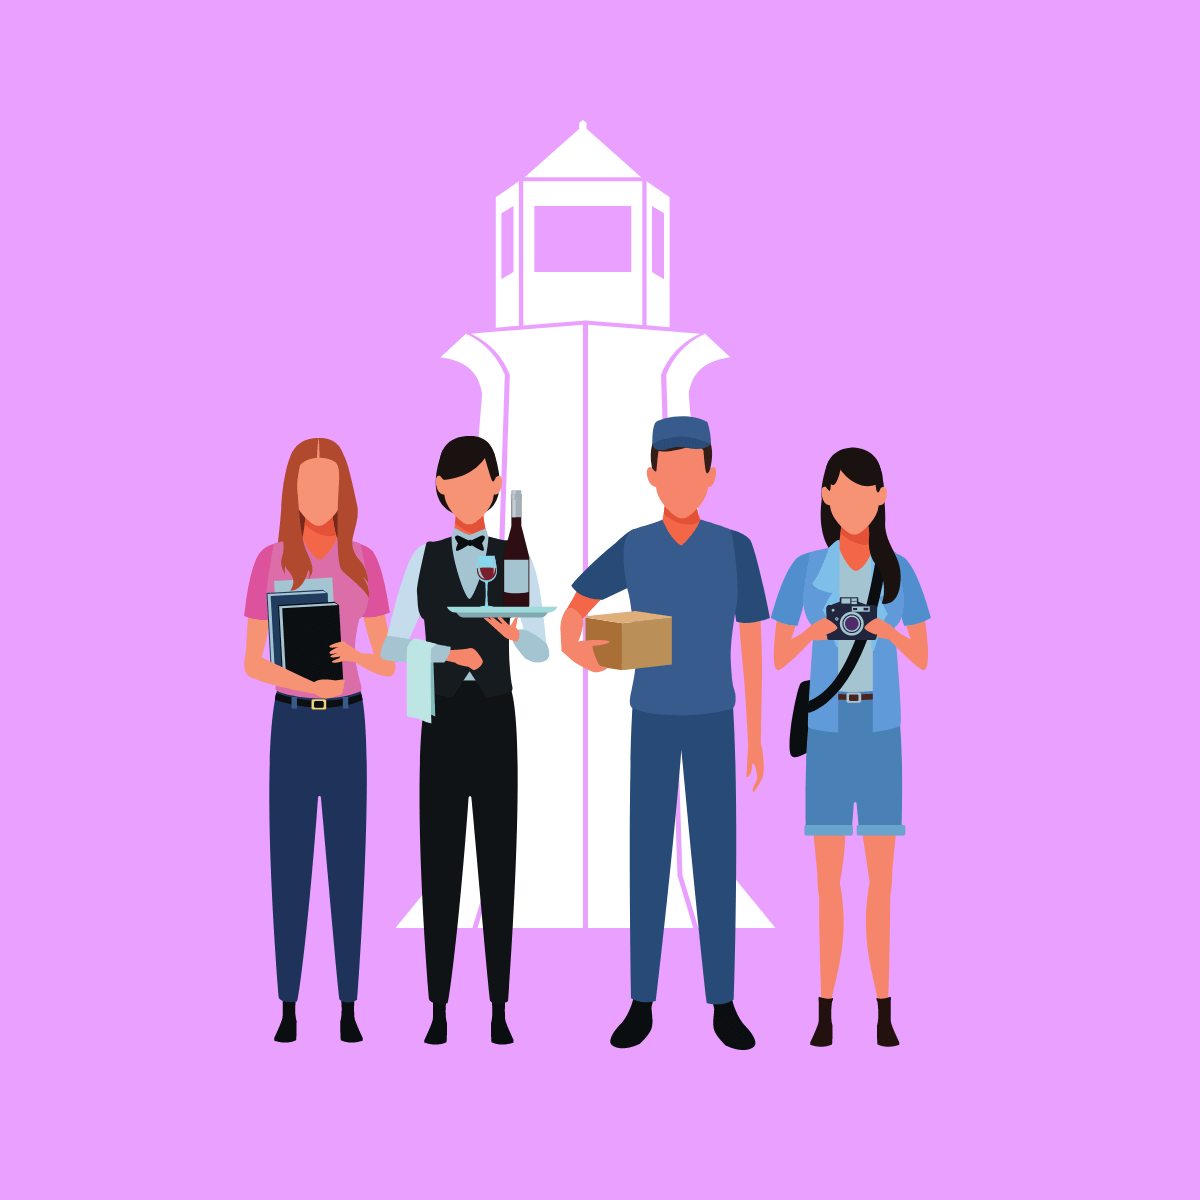 Nova Scotia Minimum Wage 2021